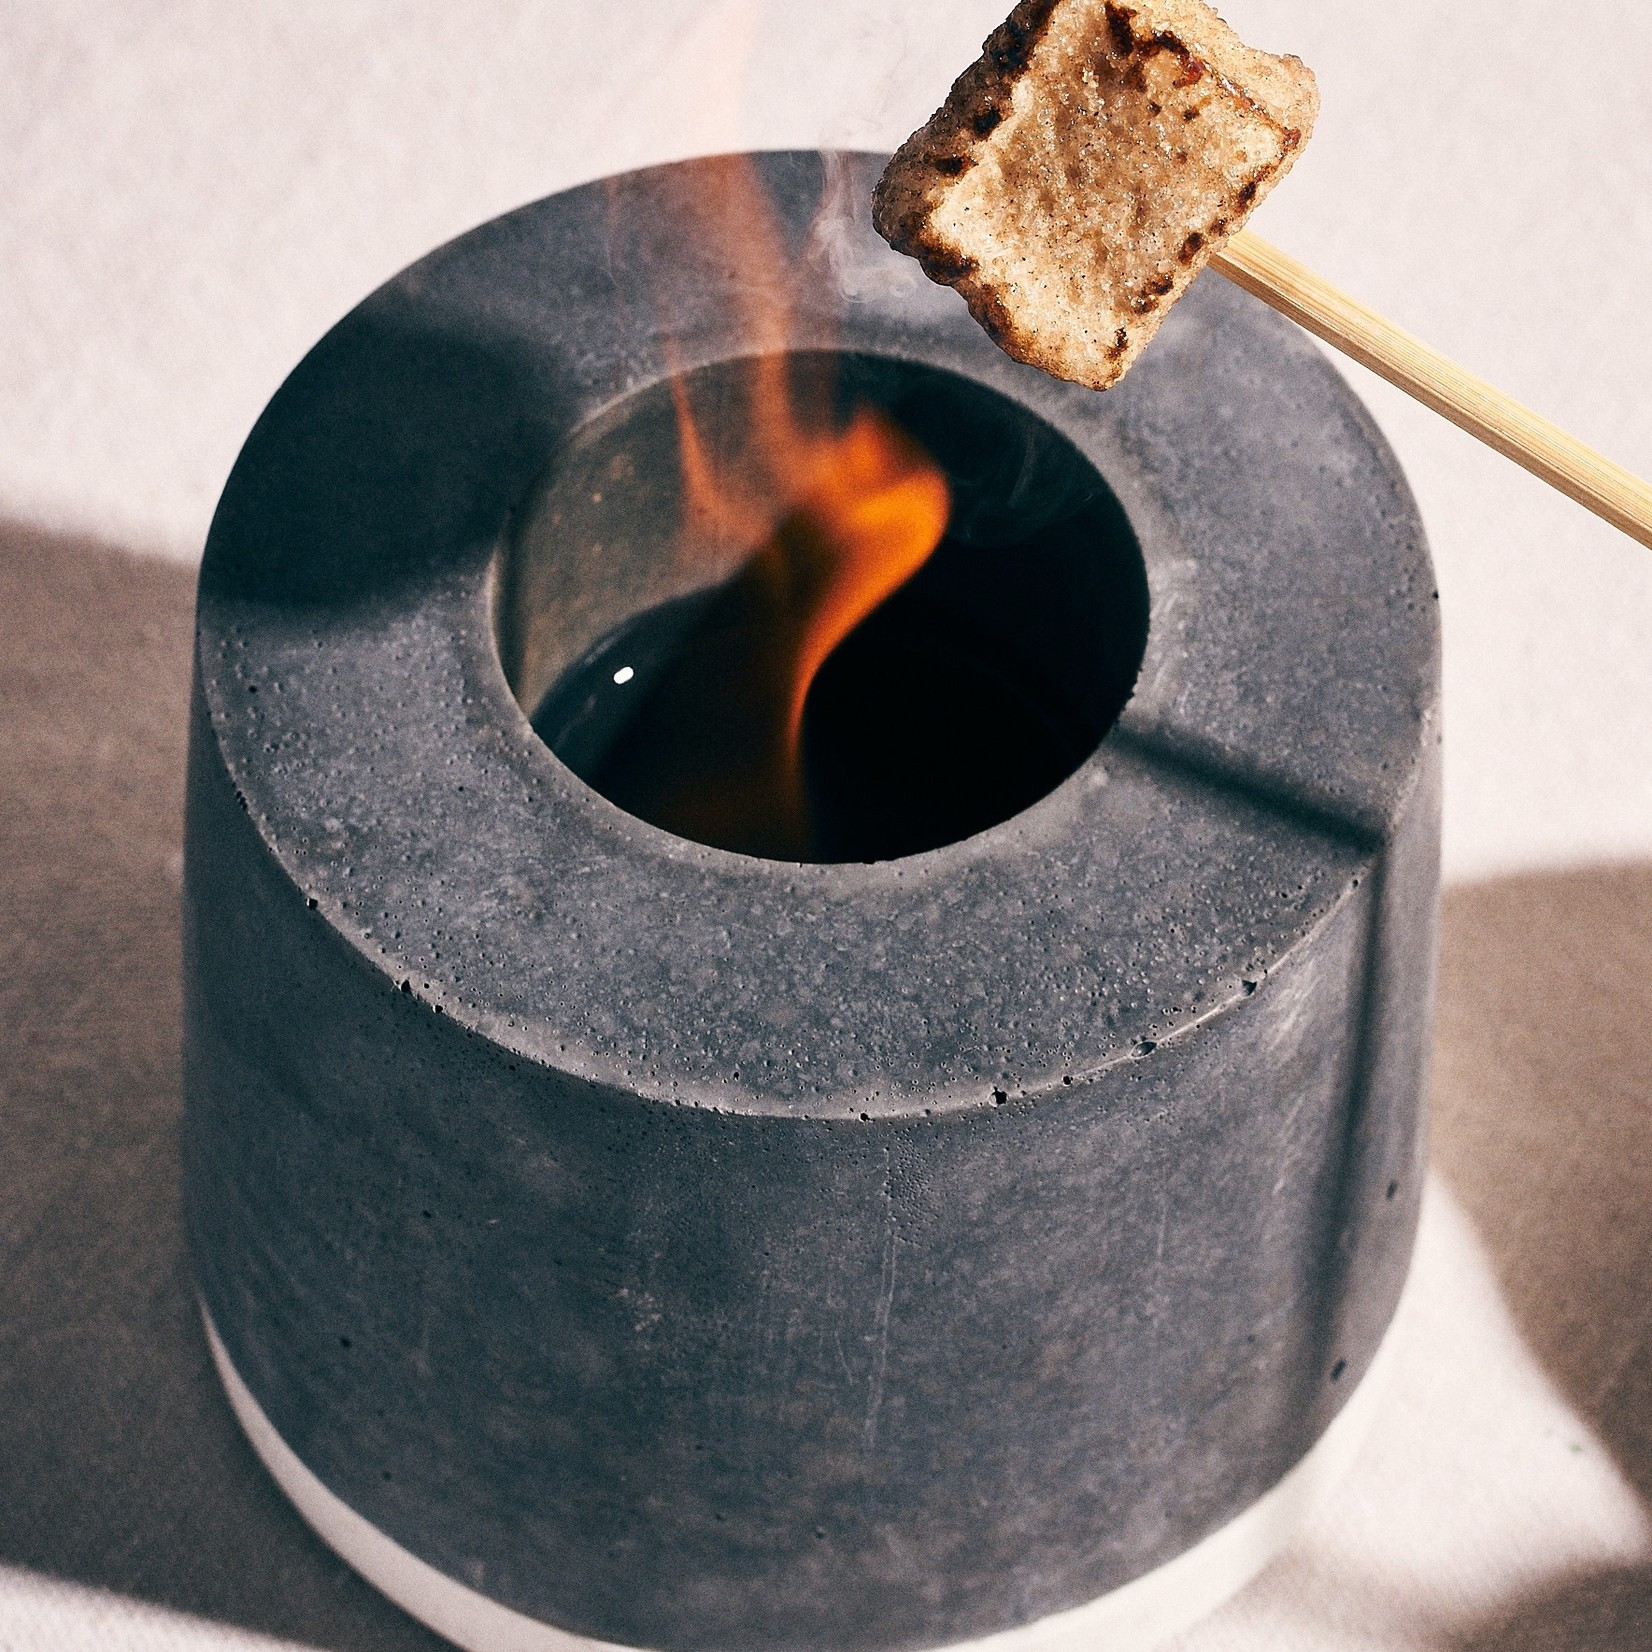 FLÎKR Fireplace FLÎKR Fire is the Original Personal Fireplace